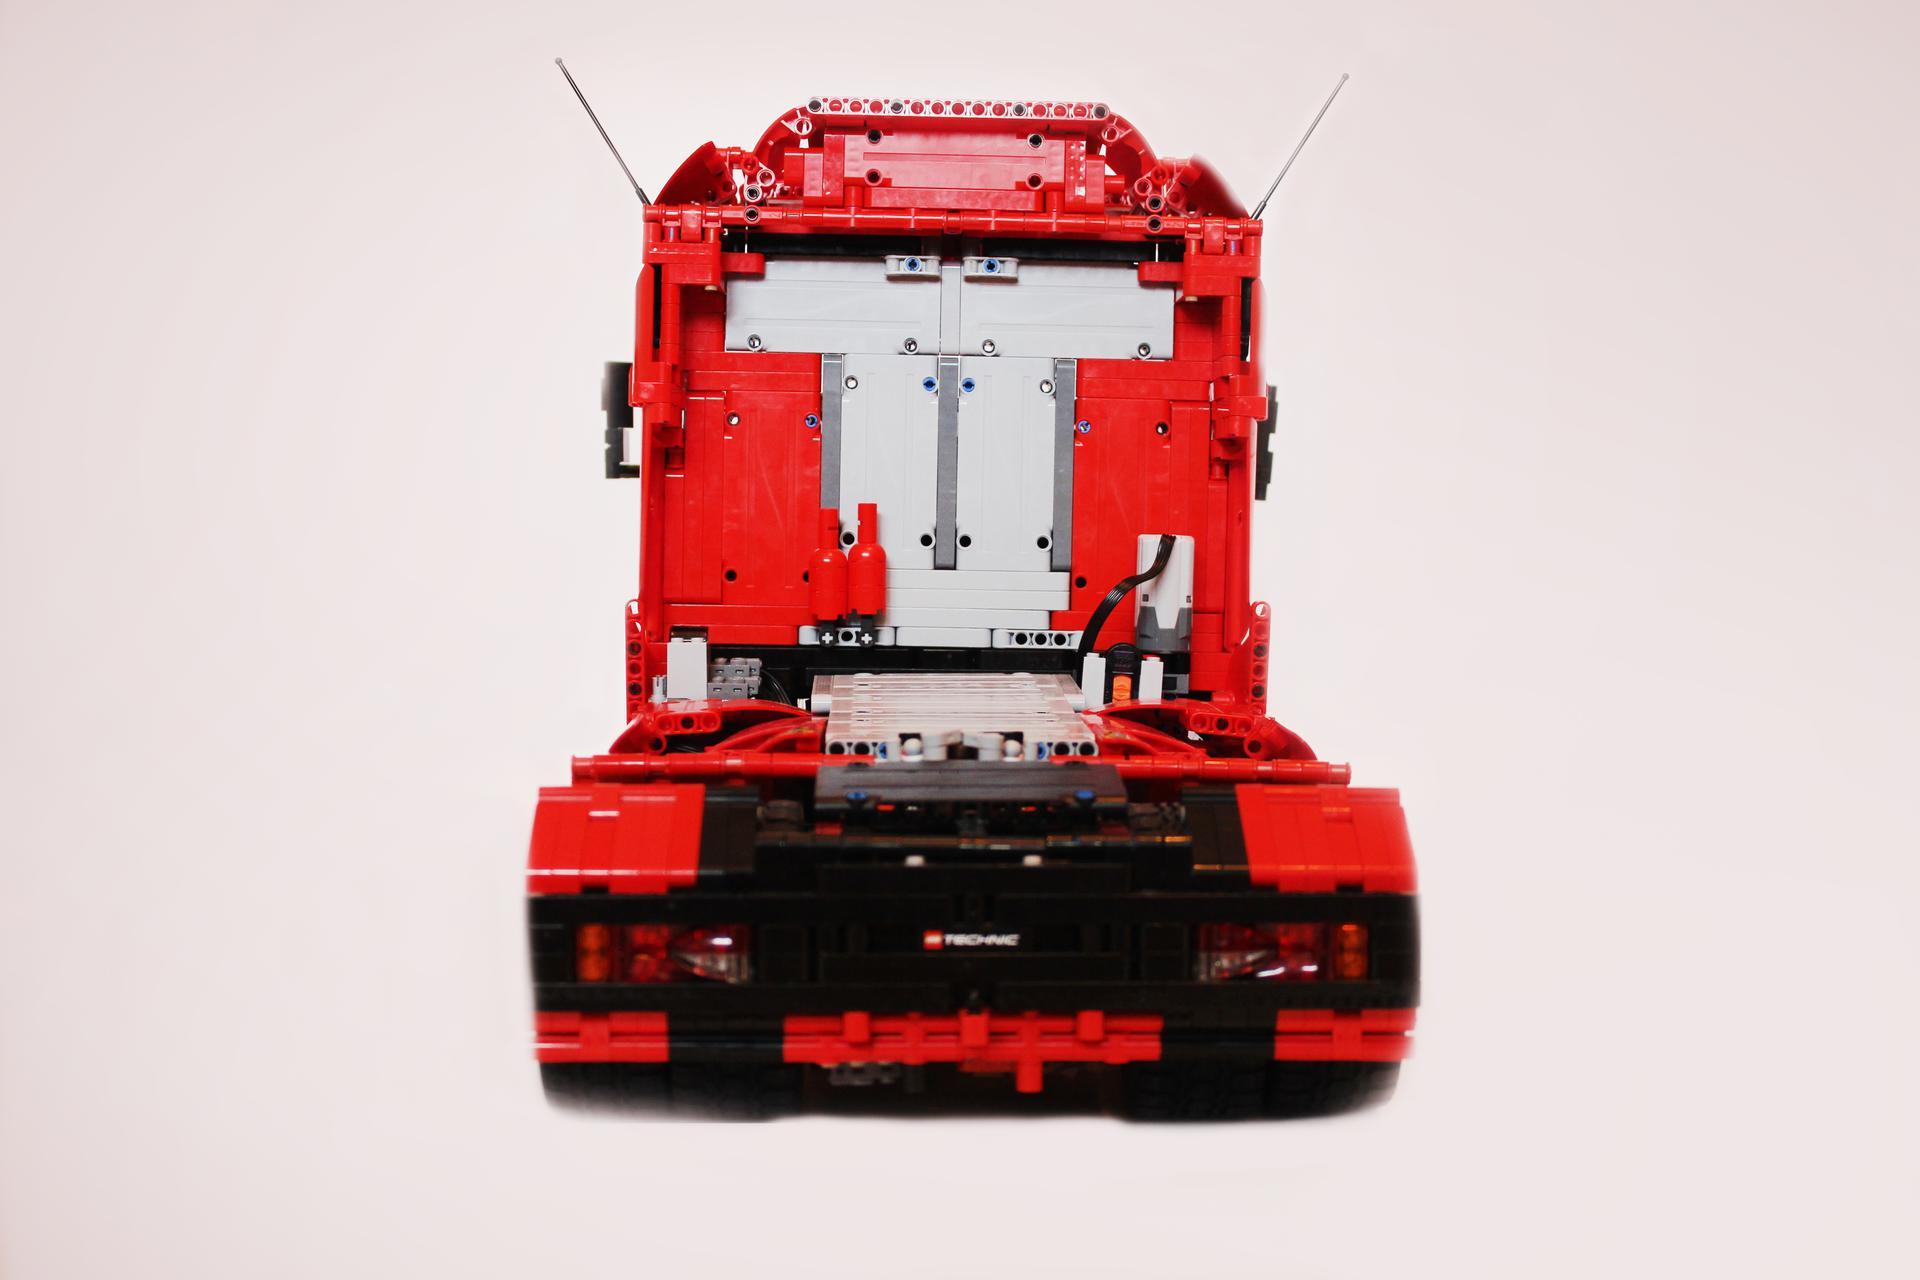 lego technic semi truck instructions